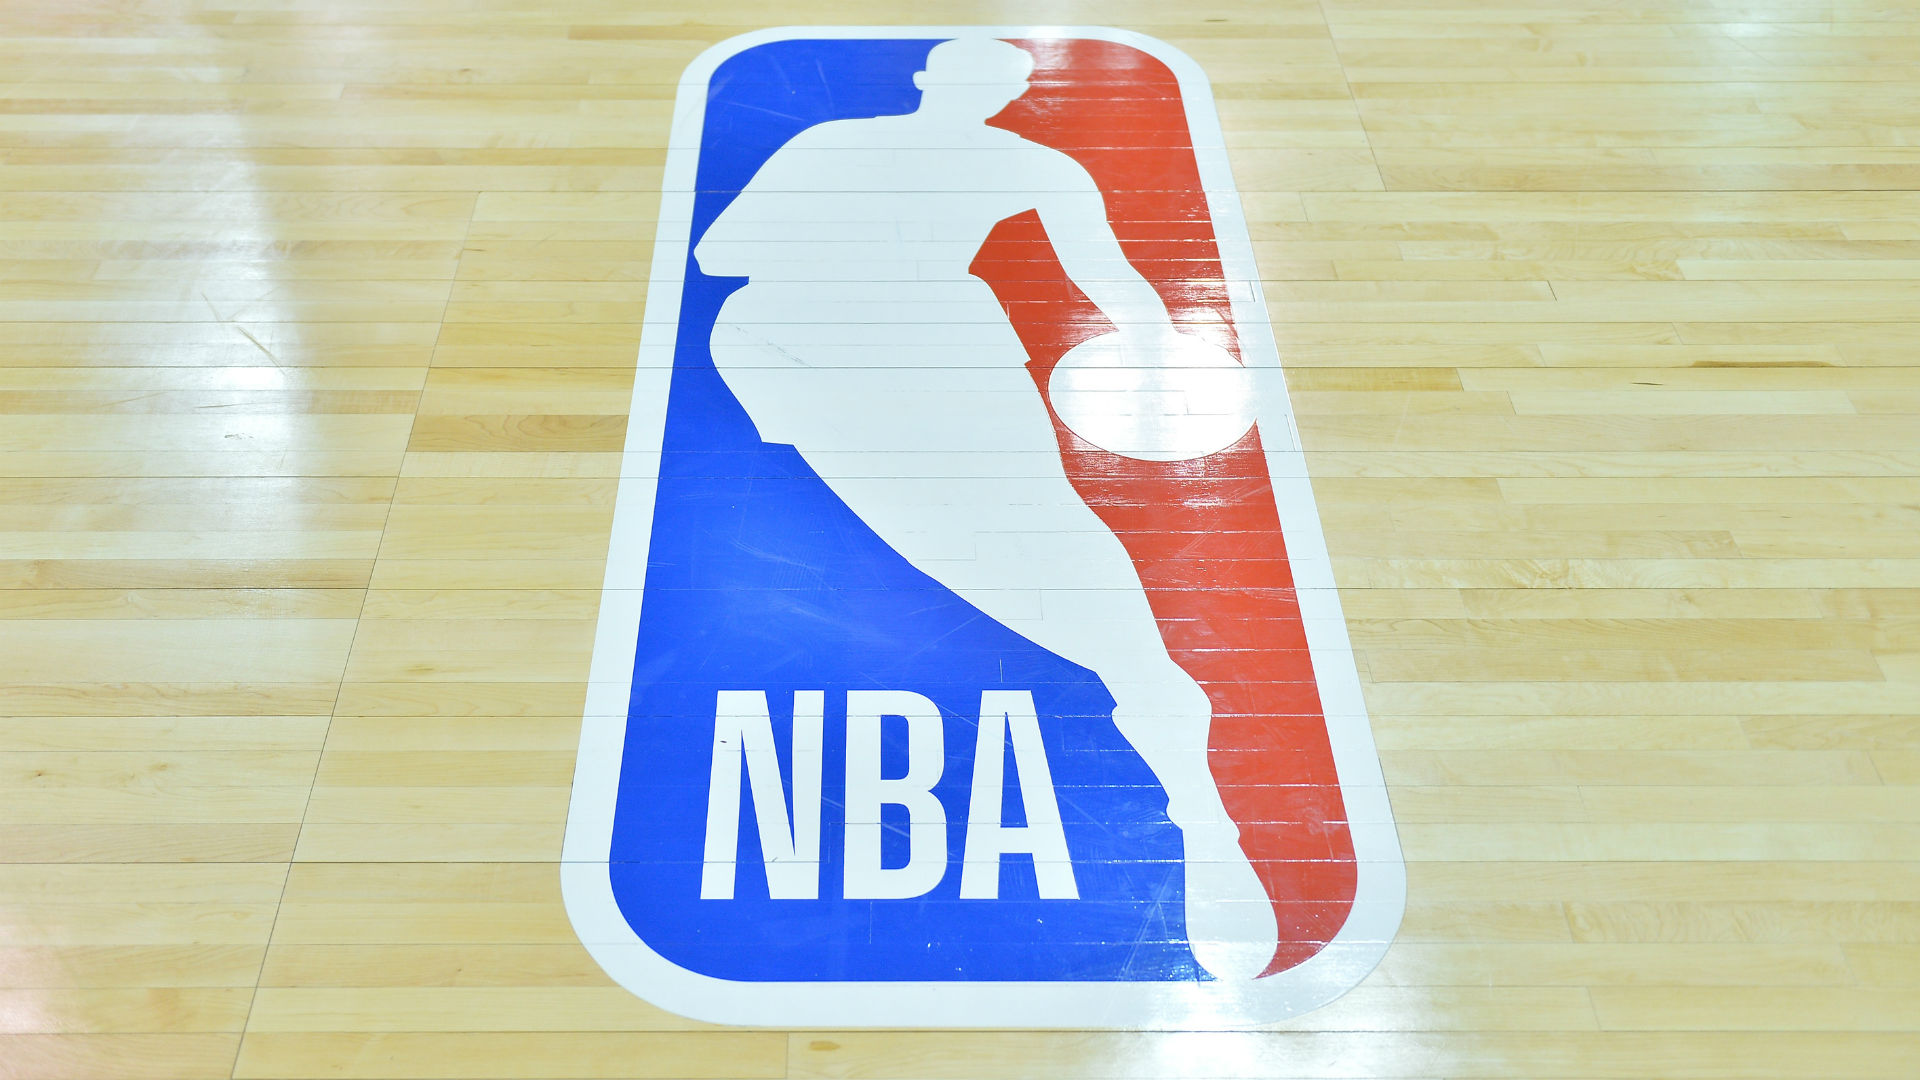 NBA Draft 2019 rumors: At least 4 teams exploring trading picks